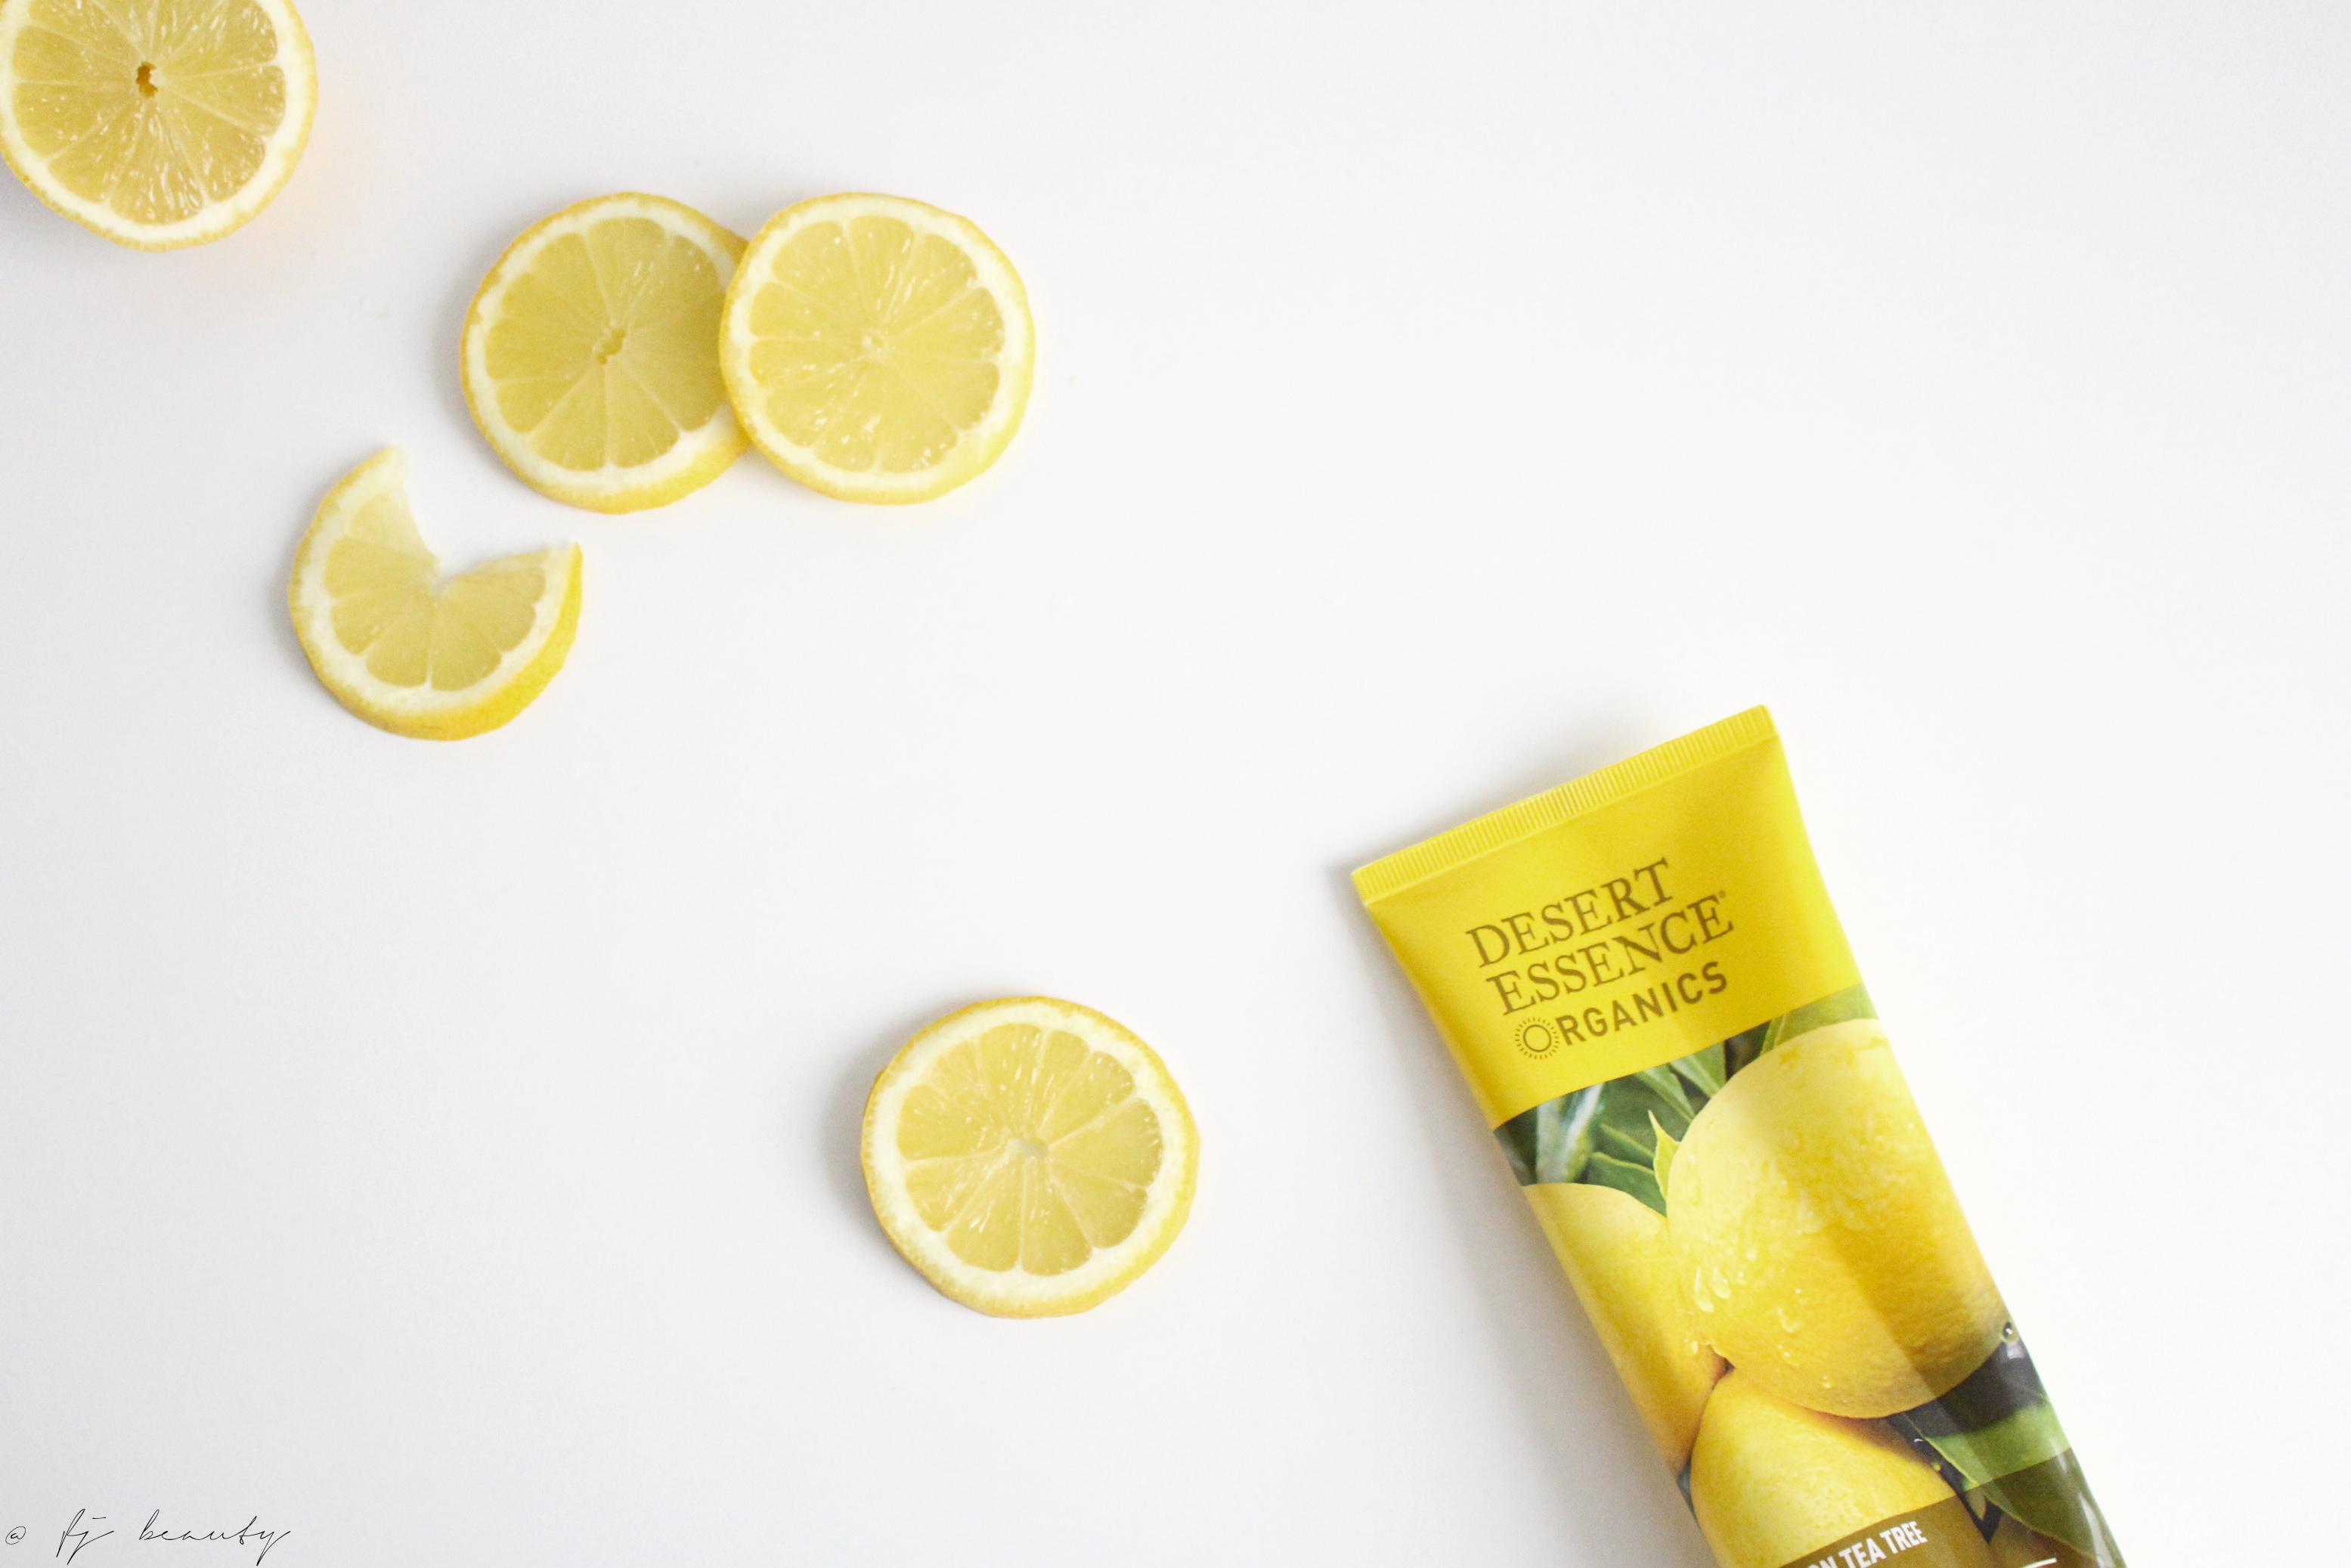 shampoing desert essence cheveux gras